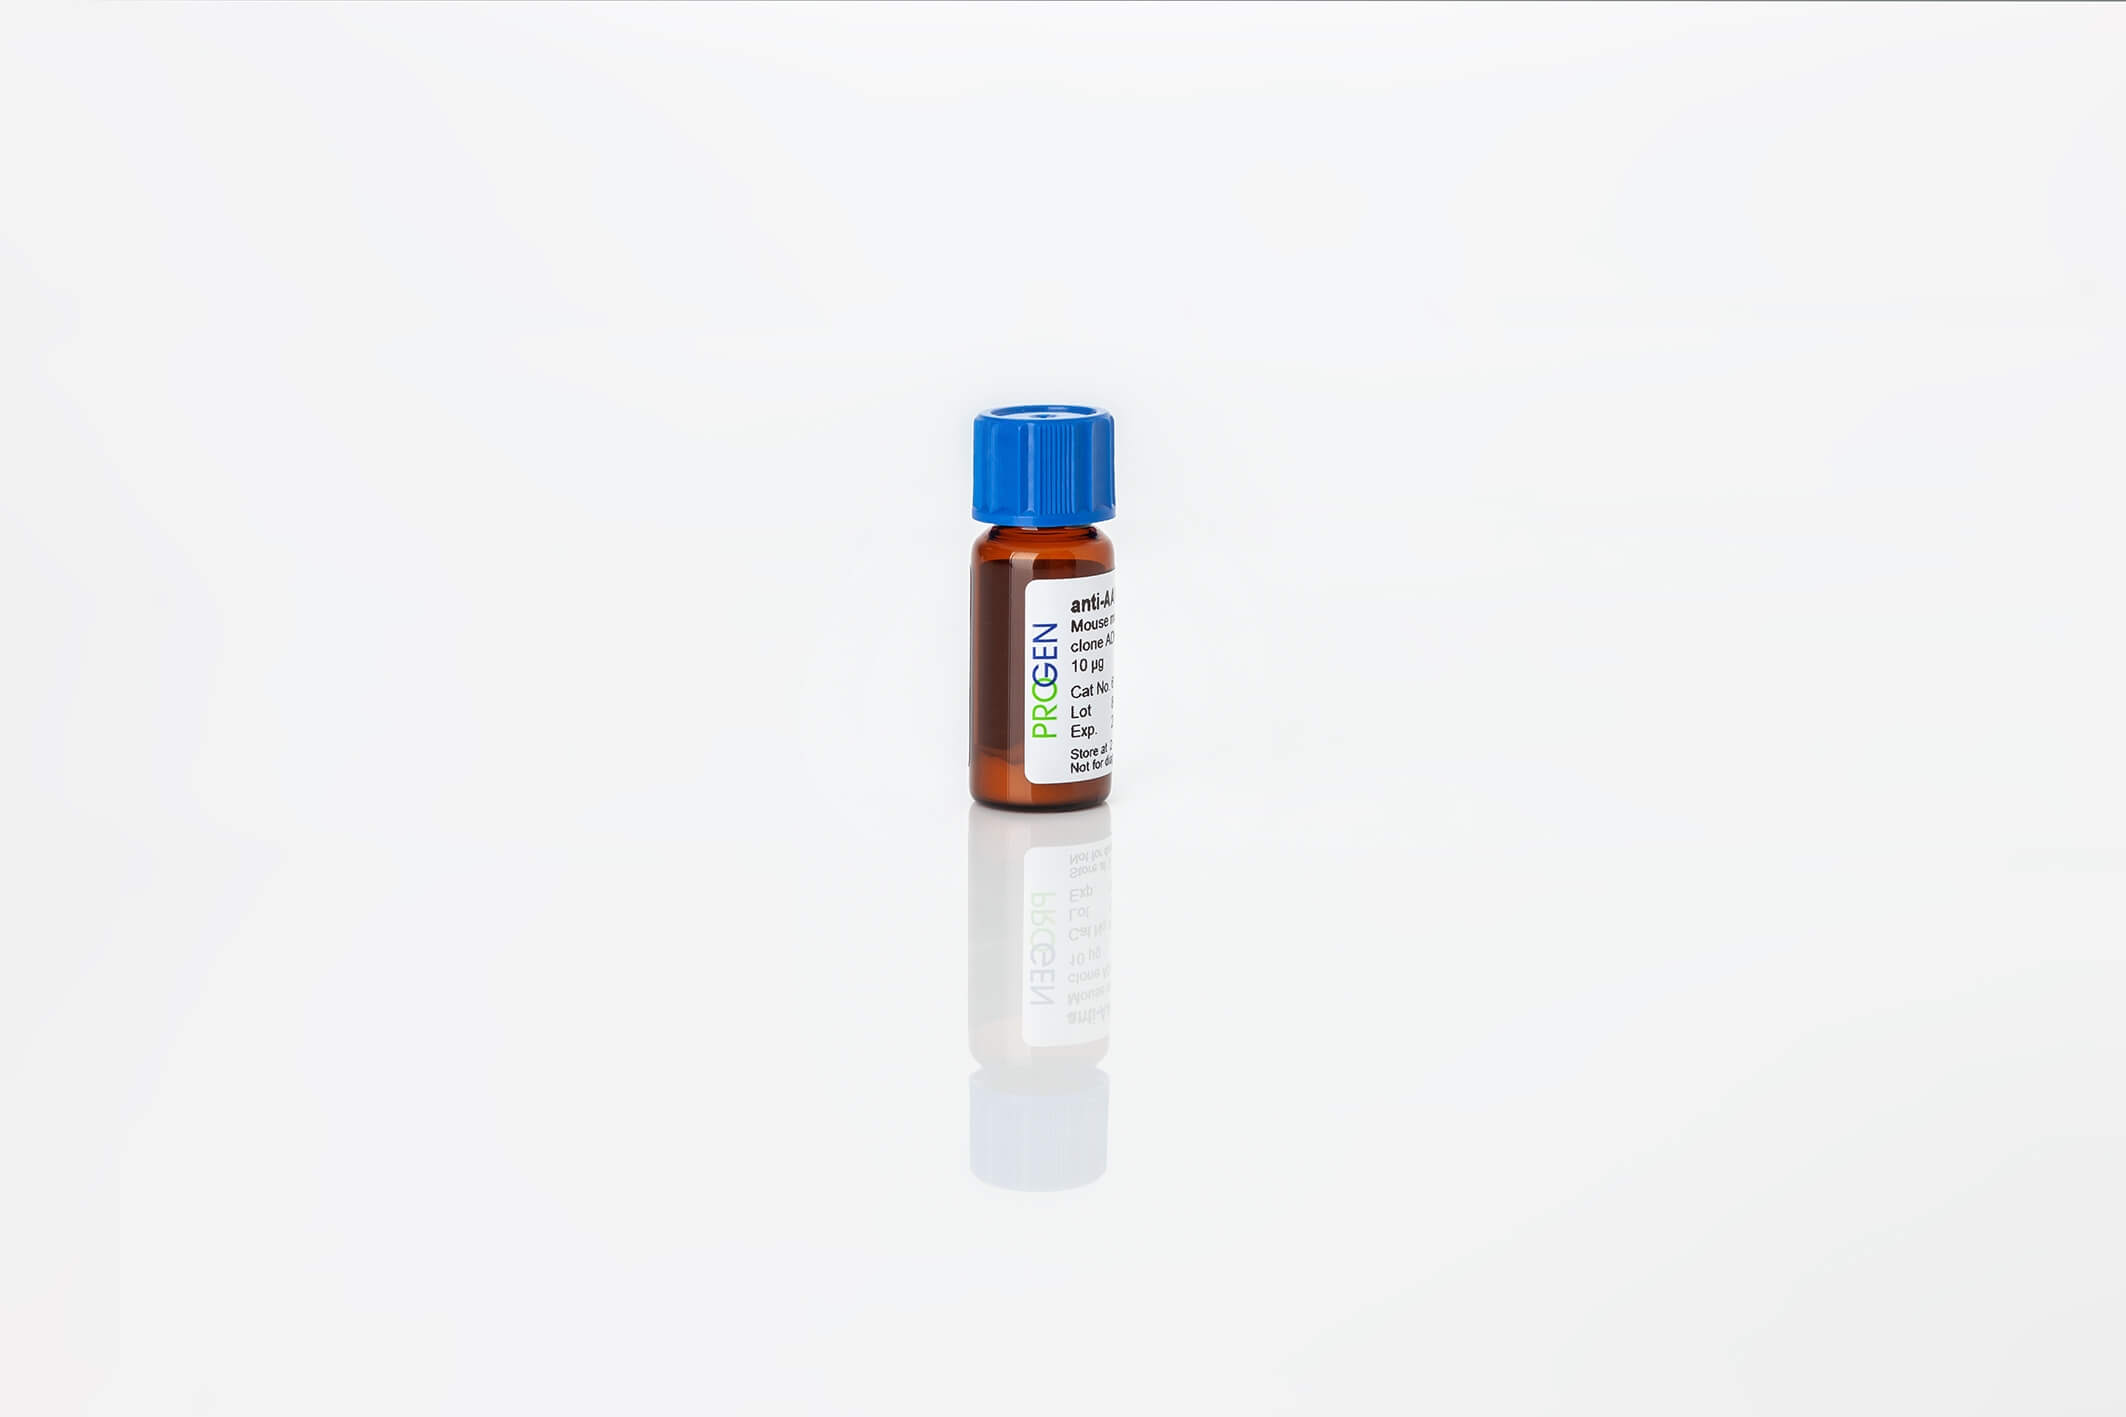 anti-Perilipin 2 (N-terminus aa 6-27) guinea pig polyclonal, serum